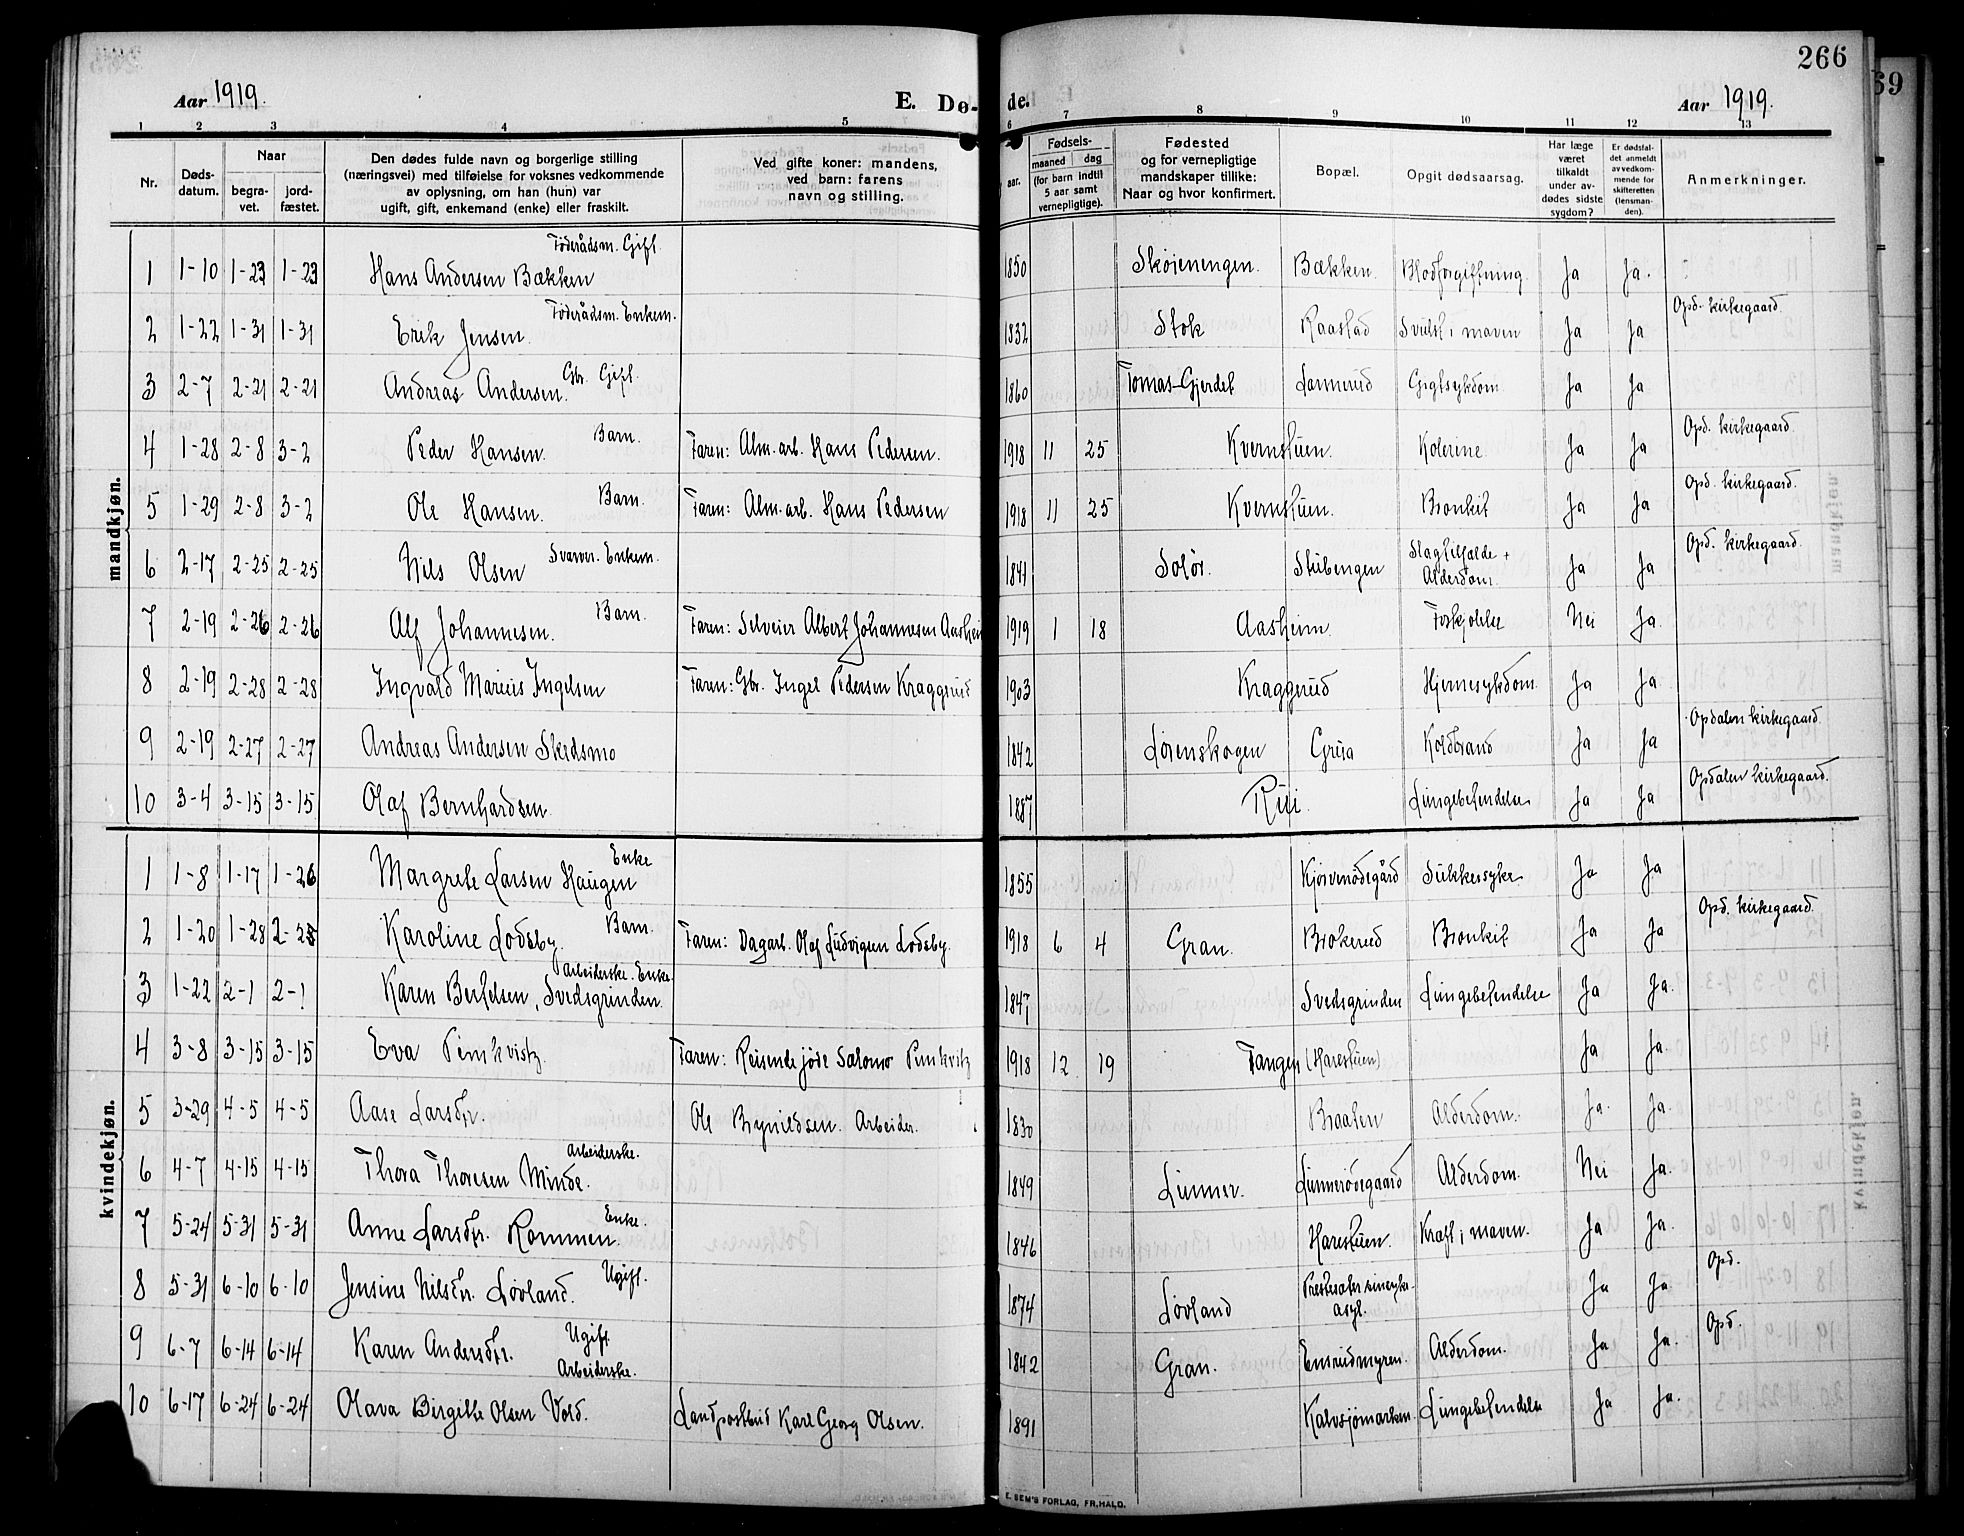 SAH, Lunner prestekontor, H/Ha/Hab/L0001: Klokkerbok nr. 1, 1909-1922, s. 266